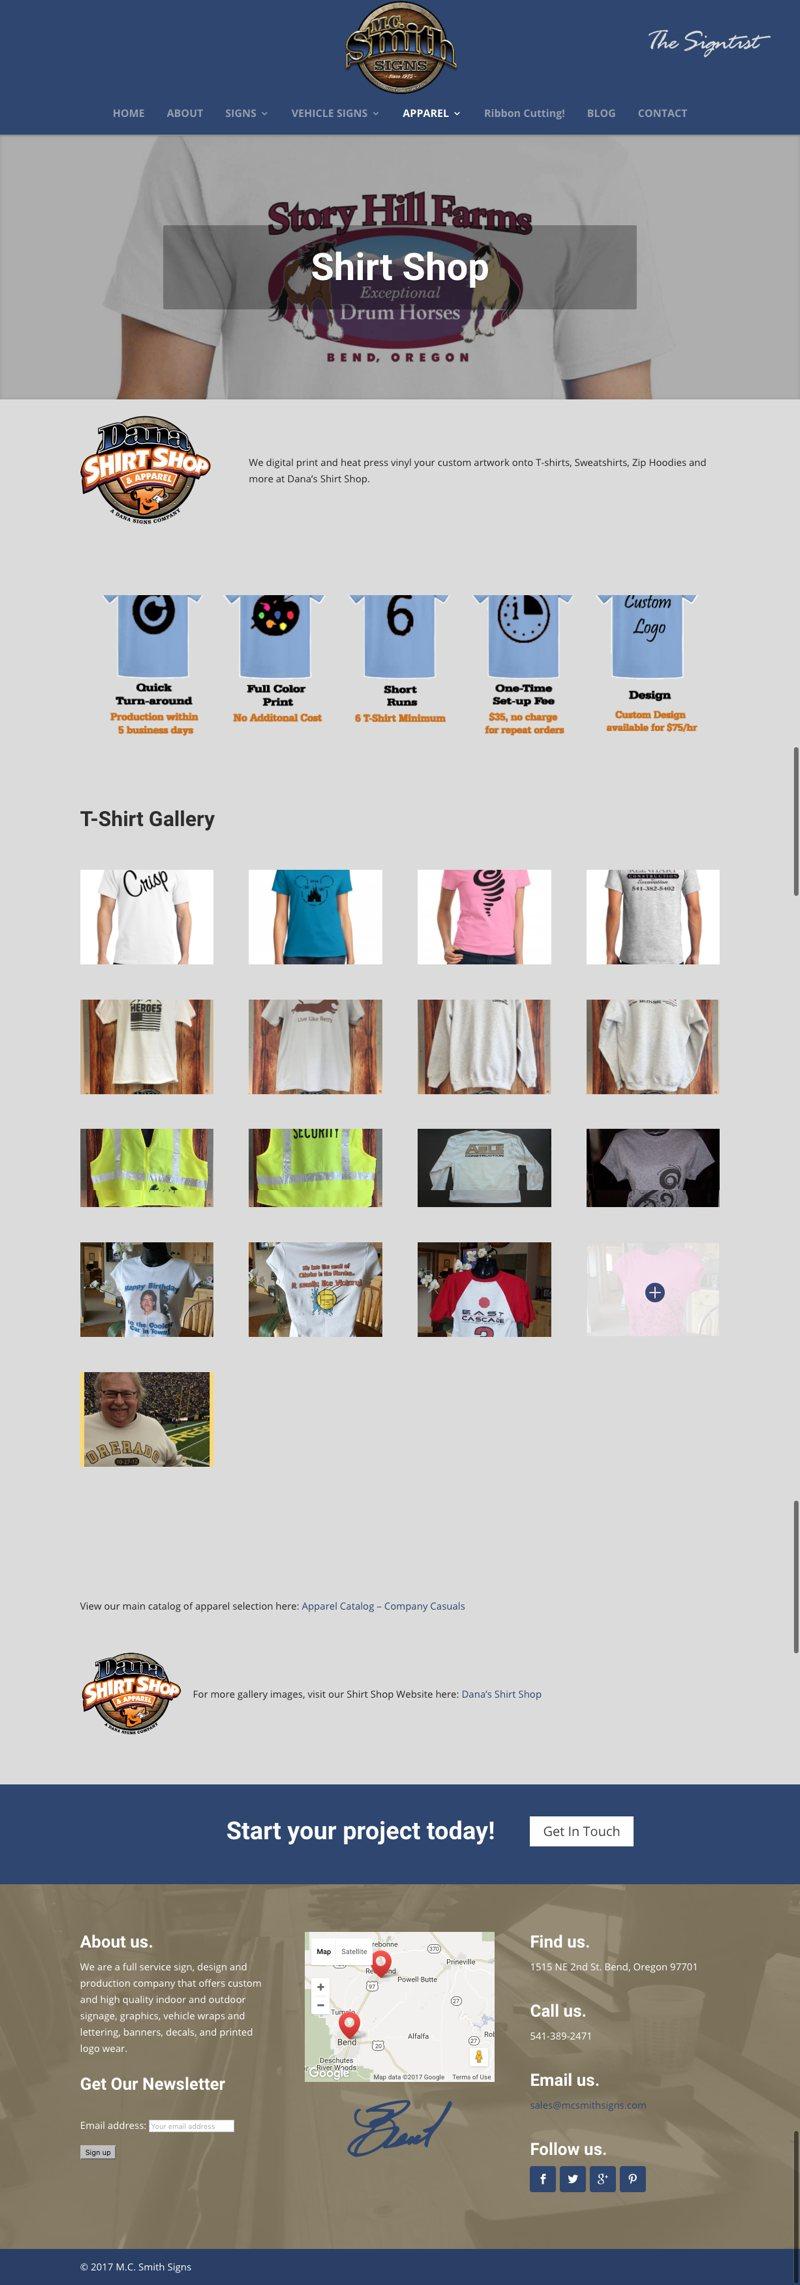 MC Smith Website Shirt Shop